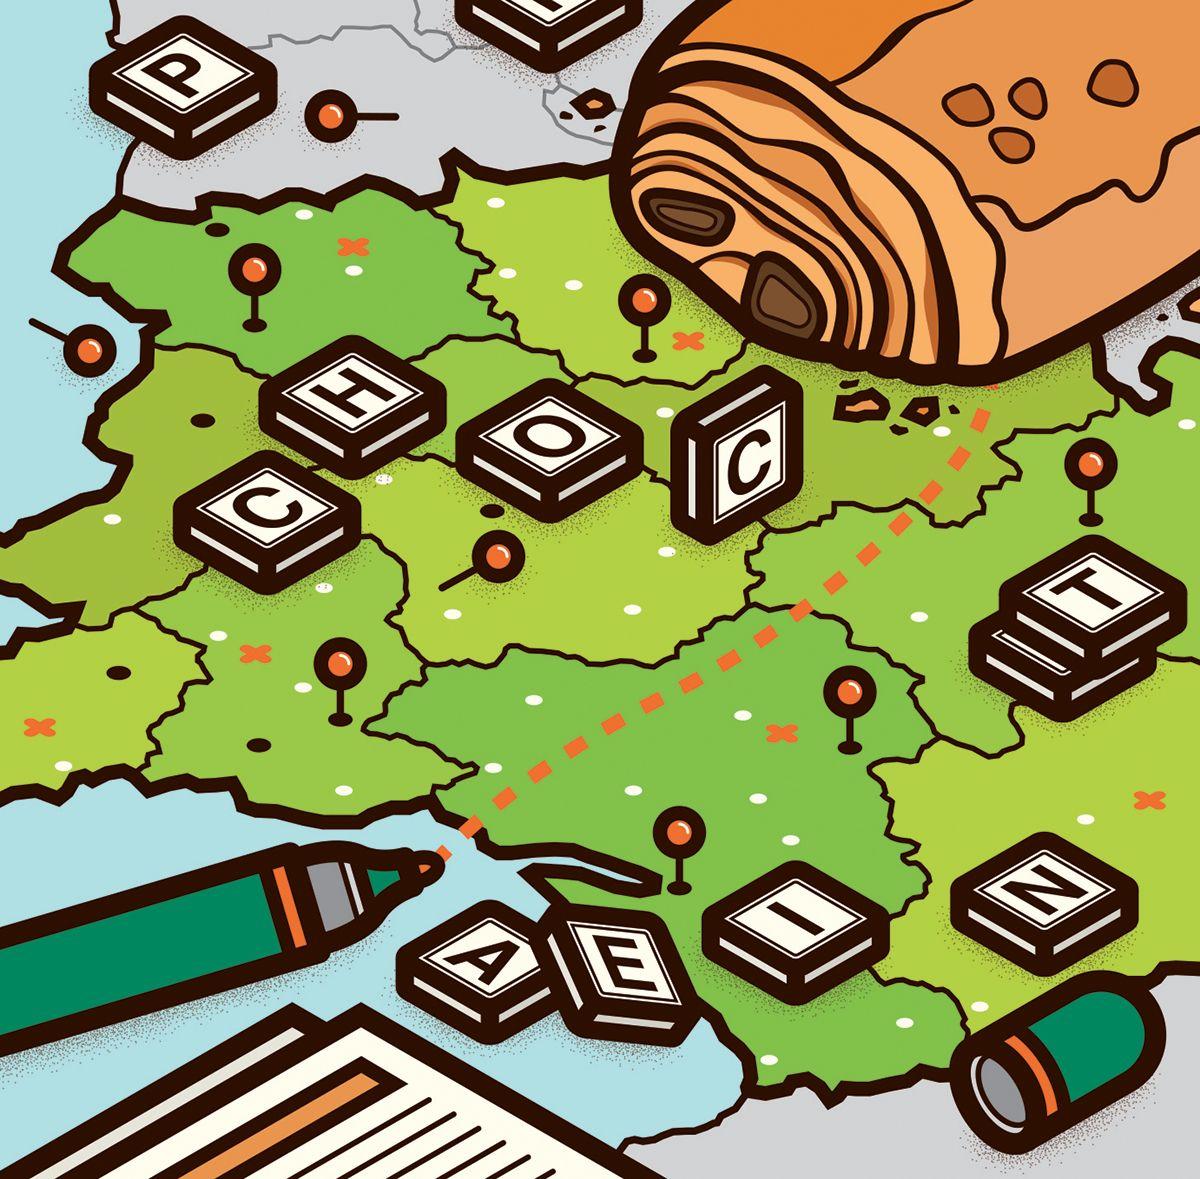 garance-illustration-Gregoire-Gicquel-CAUSETTE-Geolinguistics